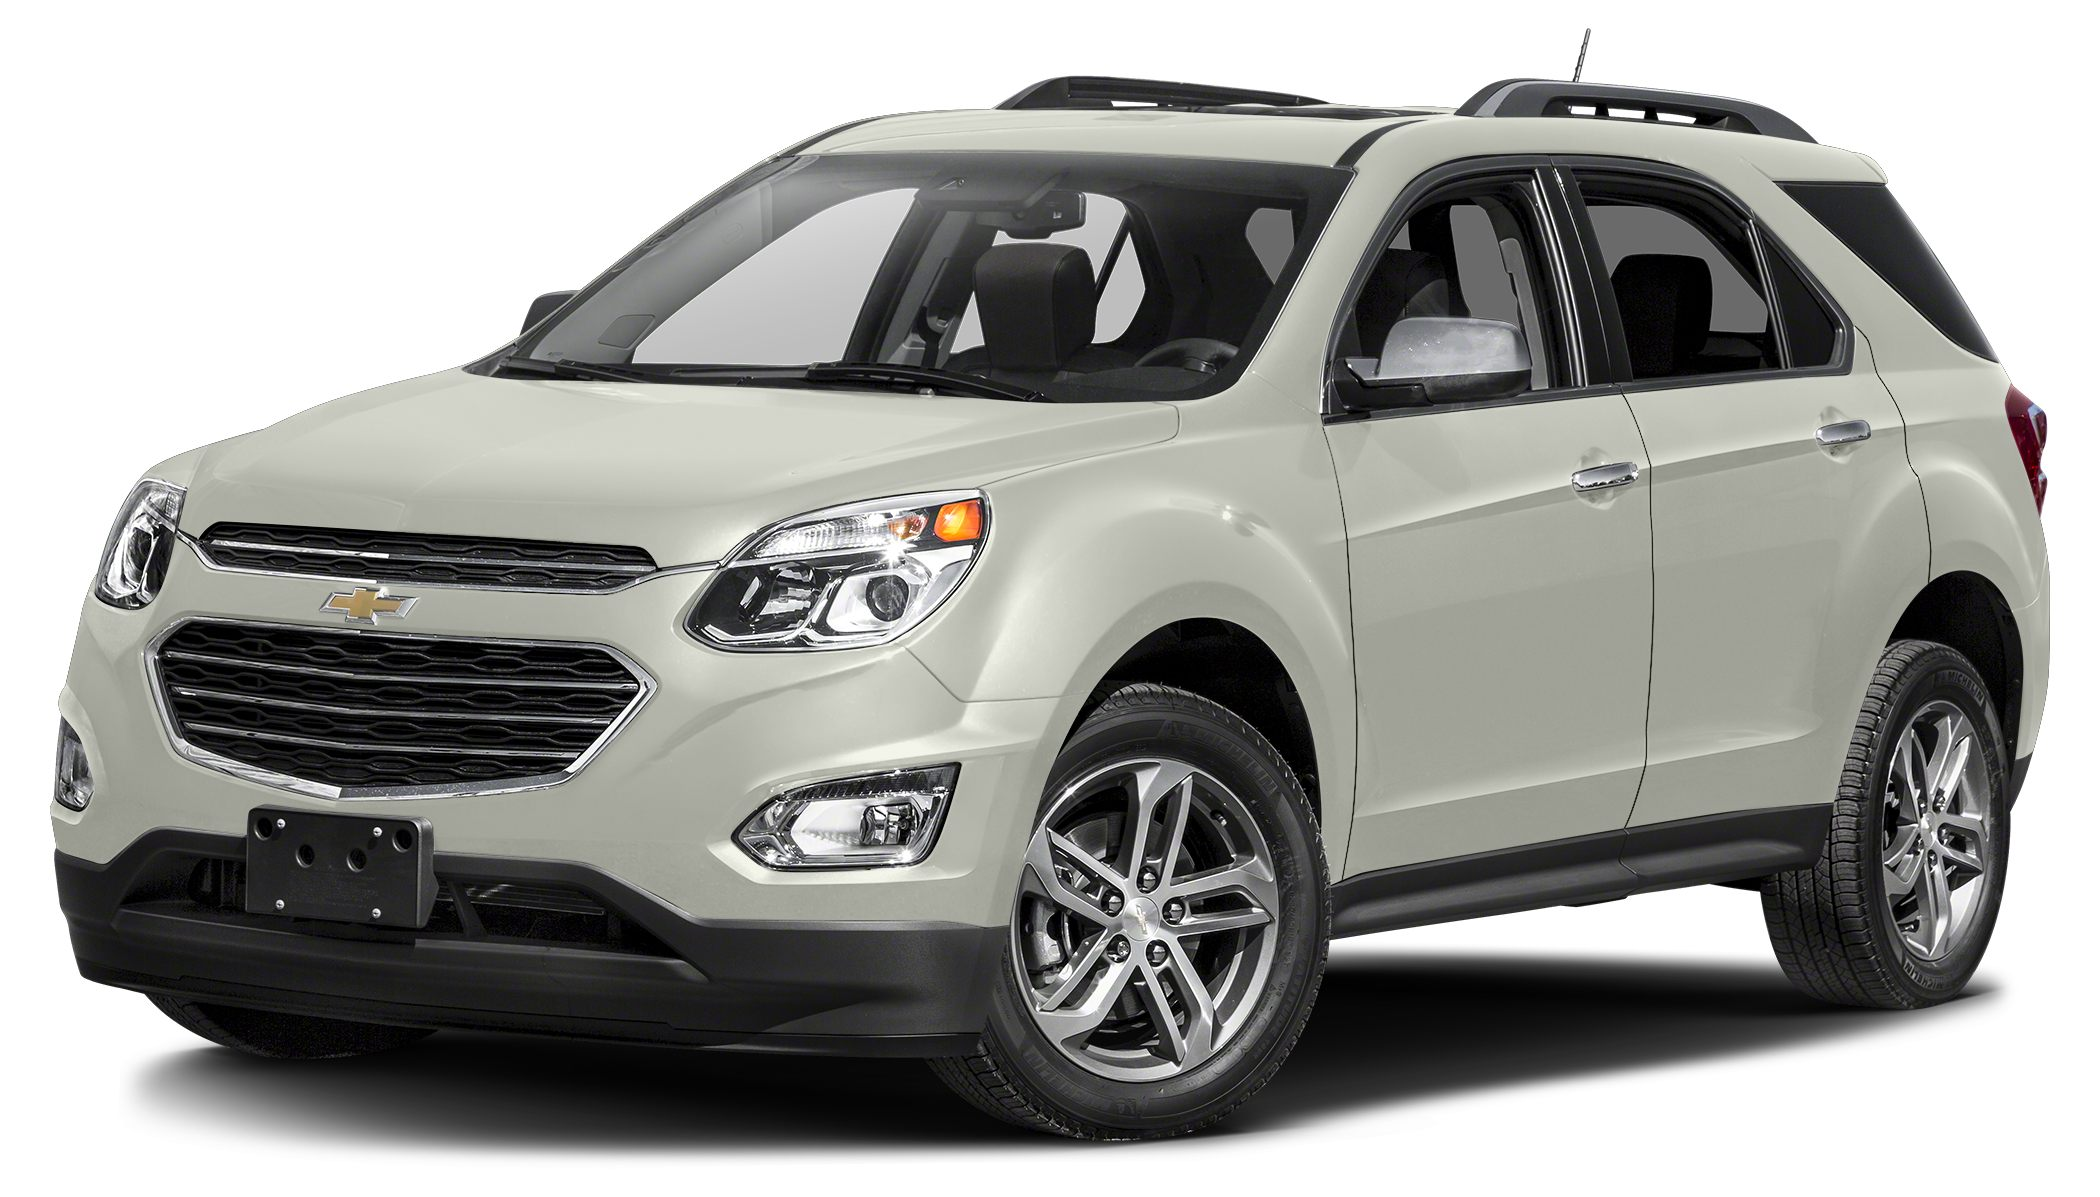 2016 Chevrolet Equinox LT Color Tungsten Metallic Stock 0SVGD9Z VIN 2GNALCEK8G6148946